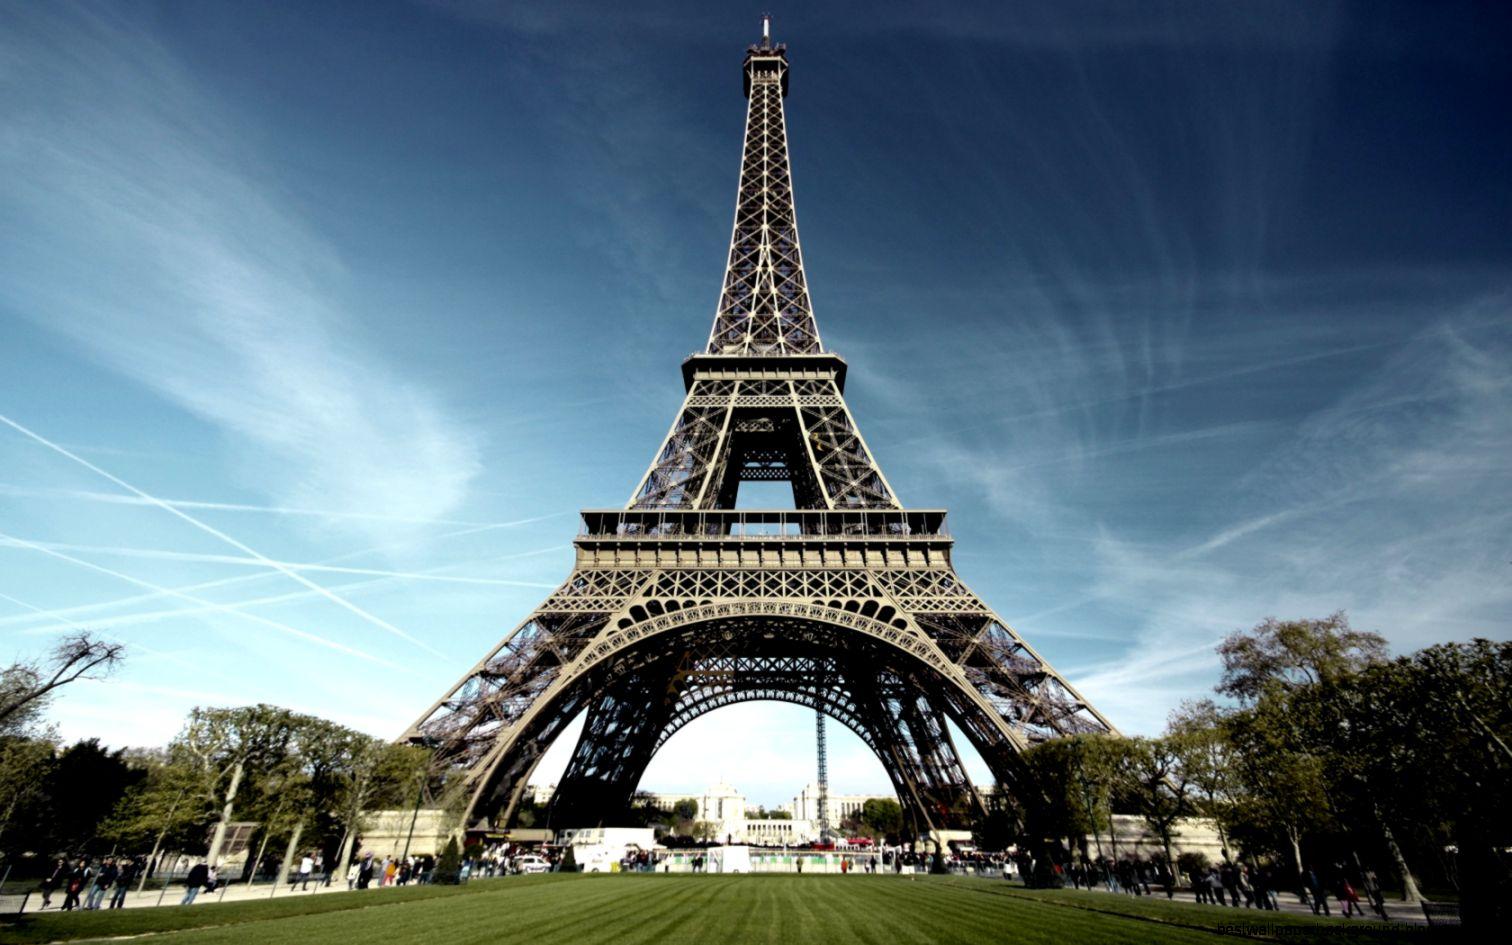 1680x1050 Paris eiffel tower Wallpaper